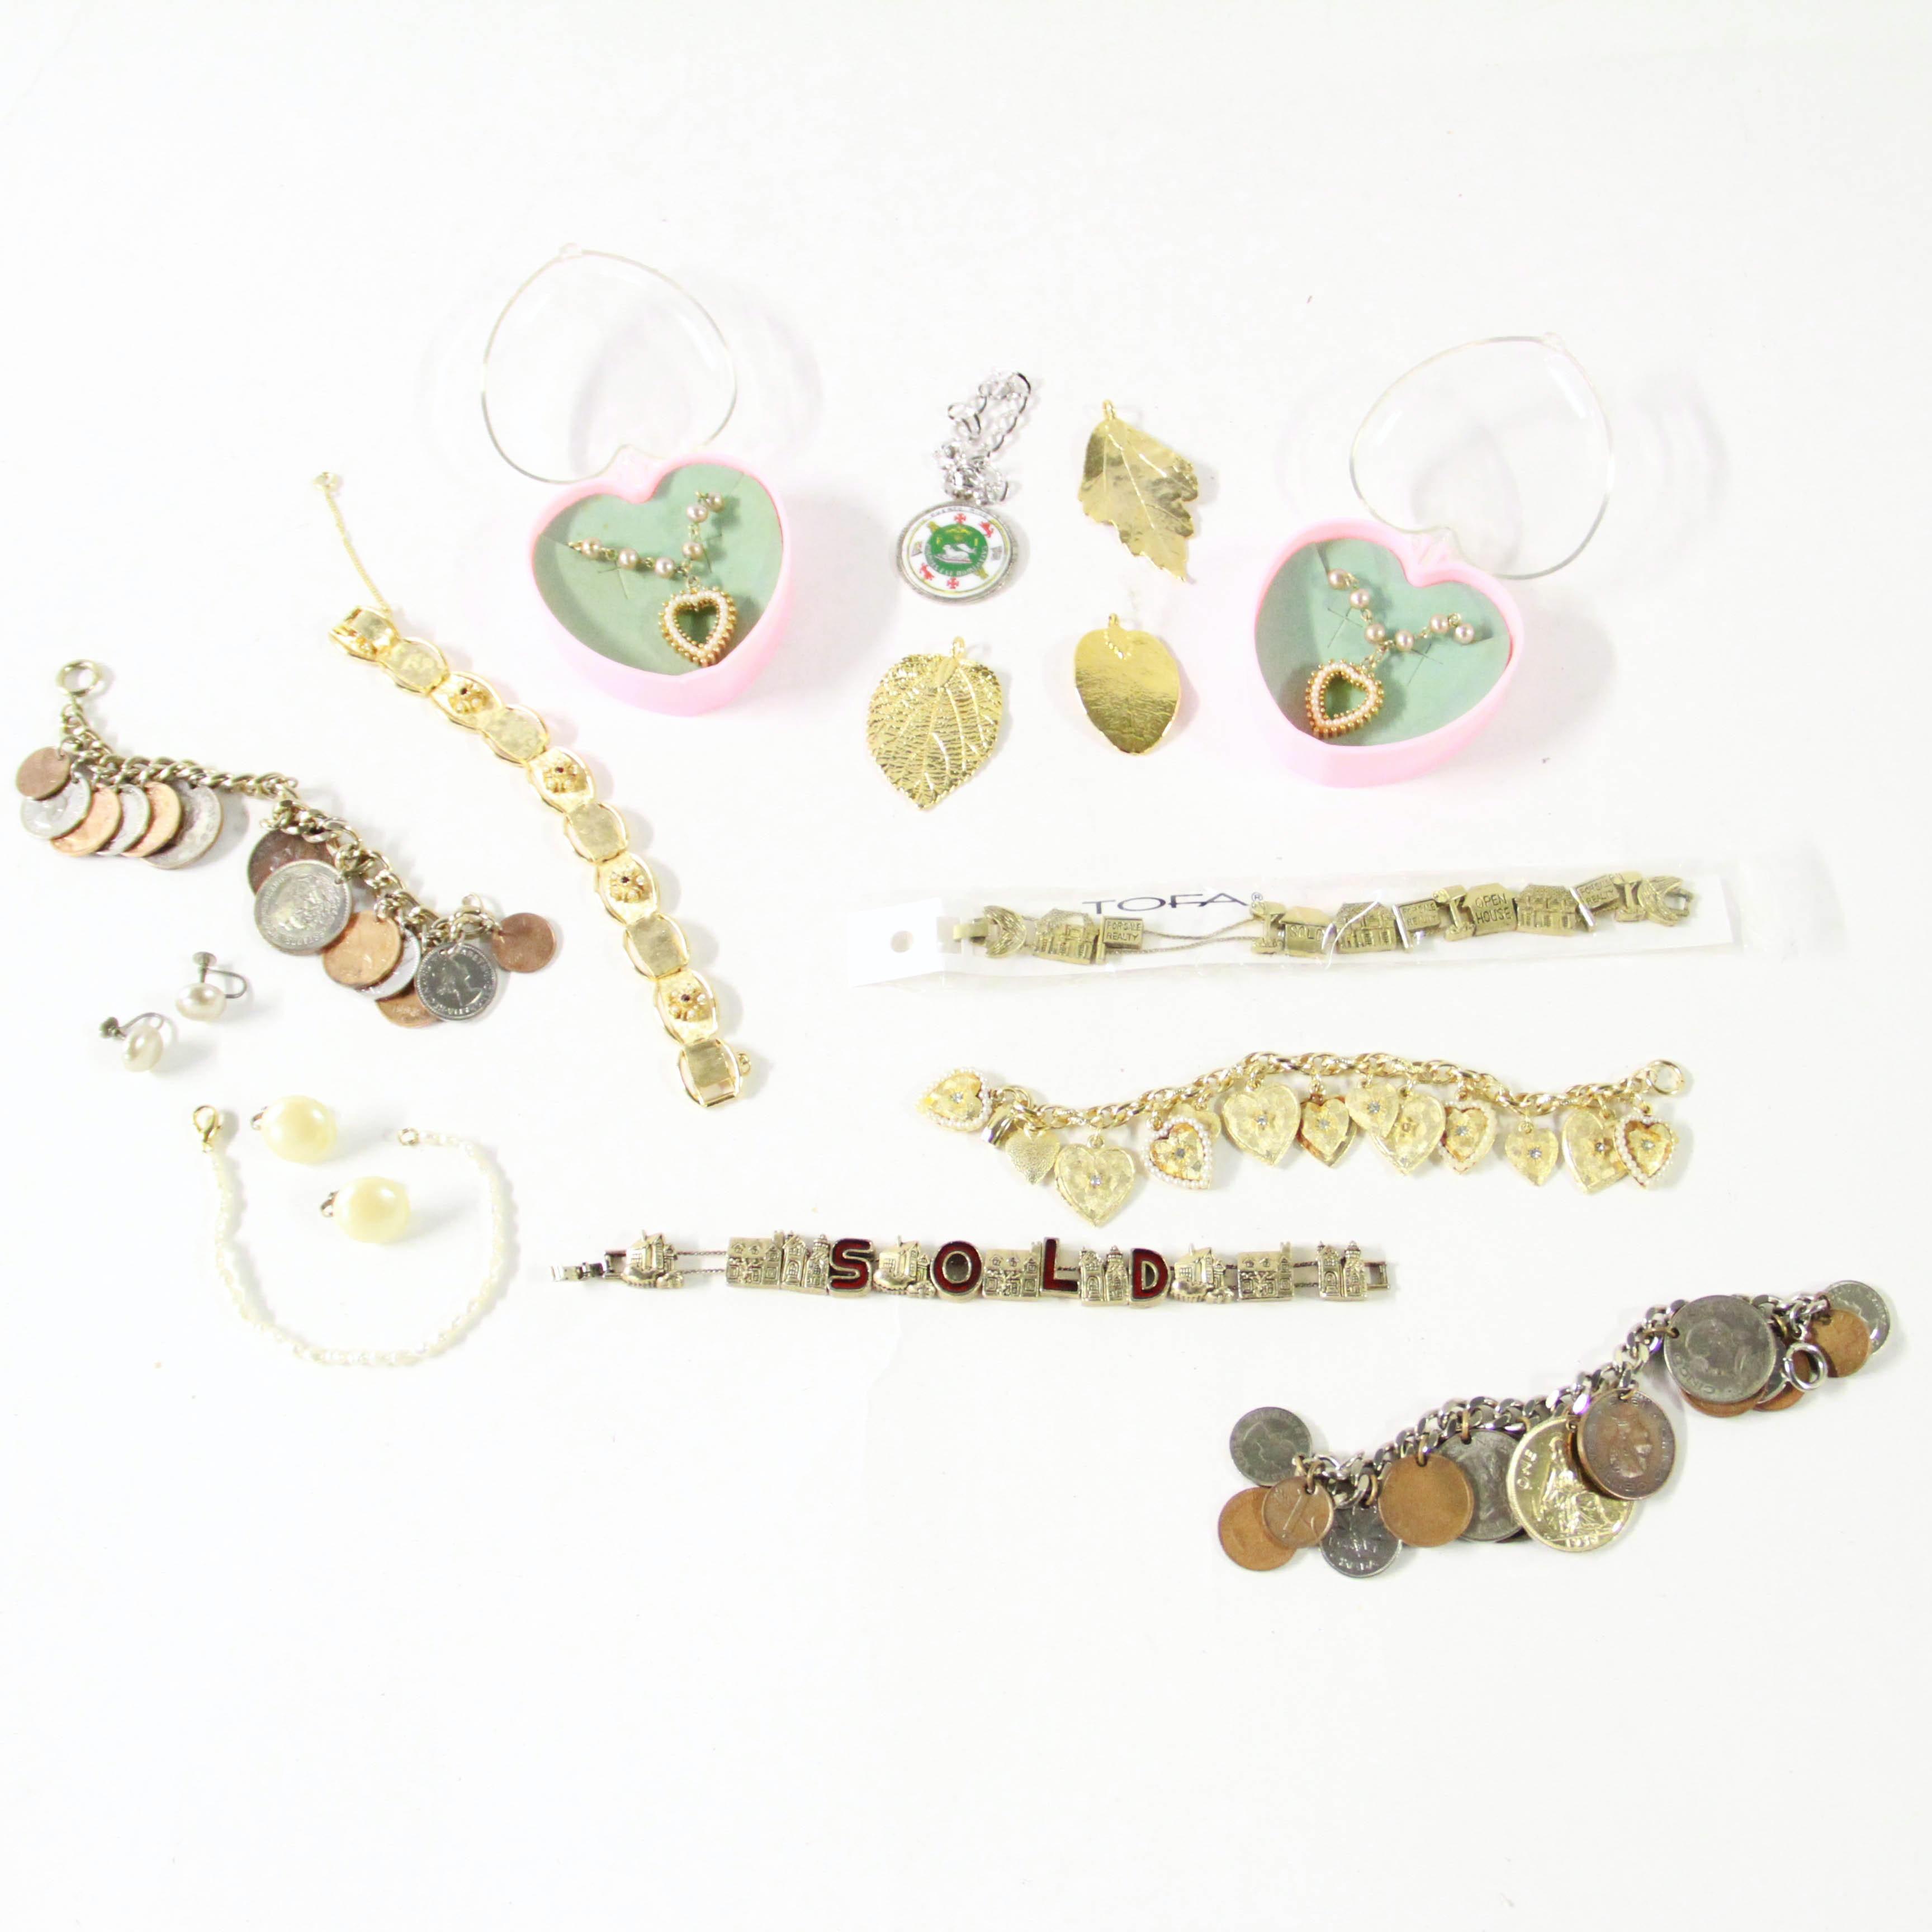 Assortment of Various Costume Jewelry